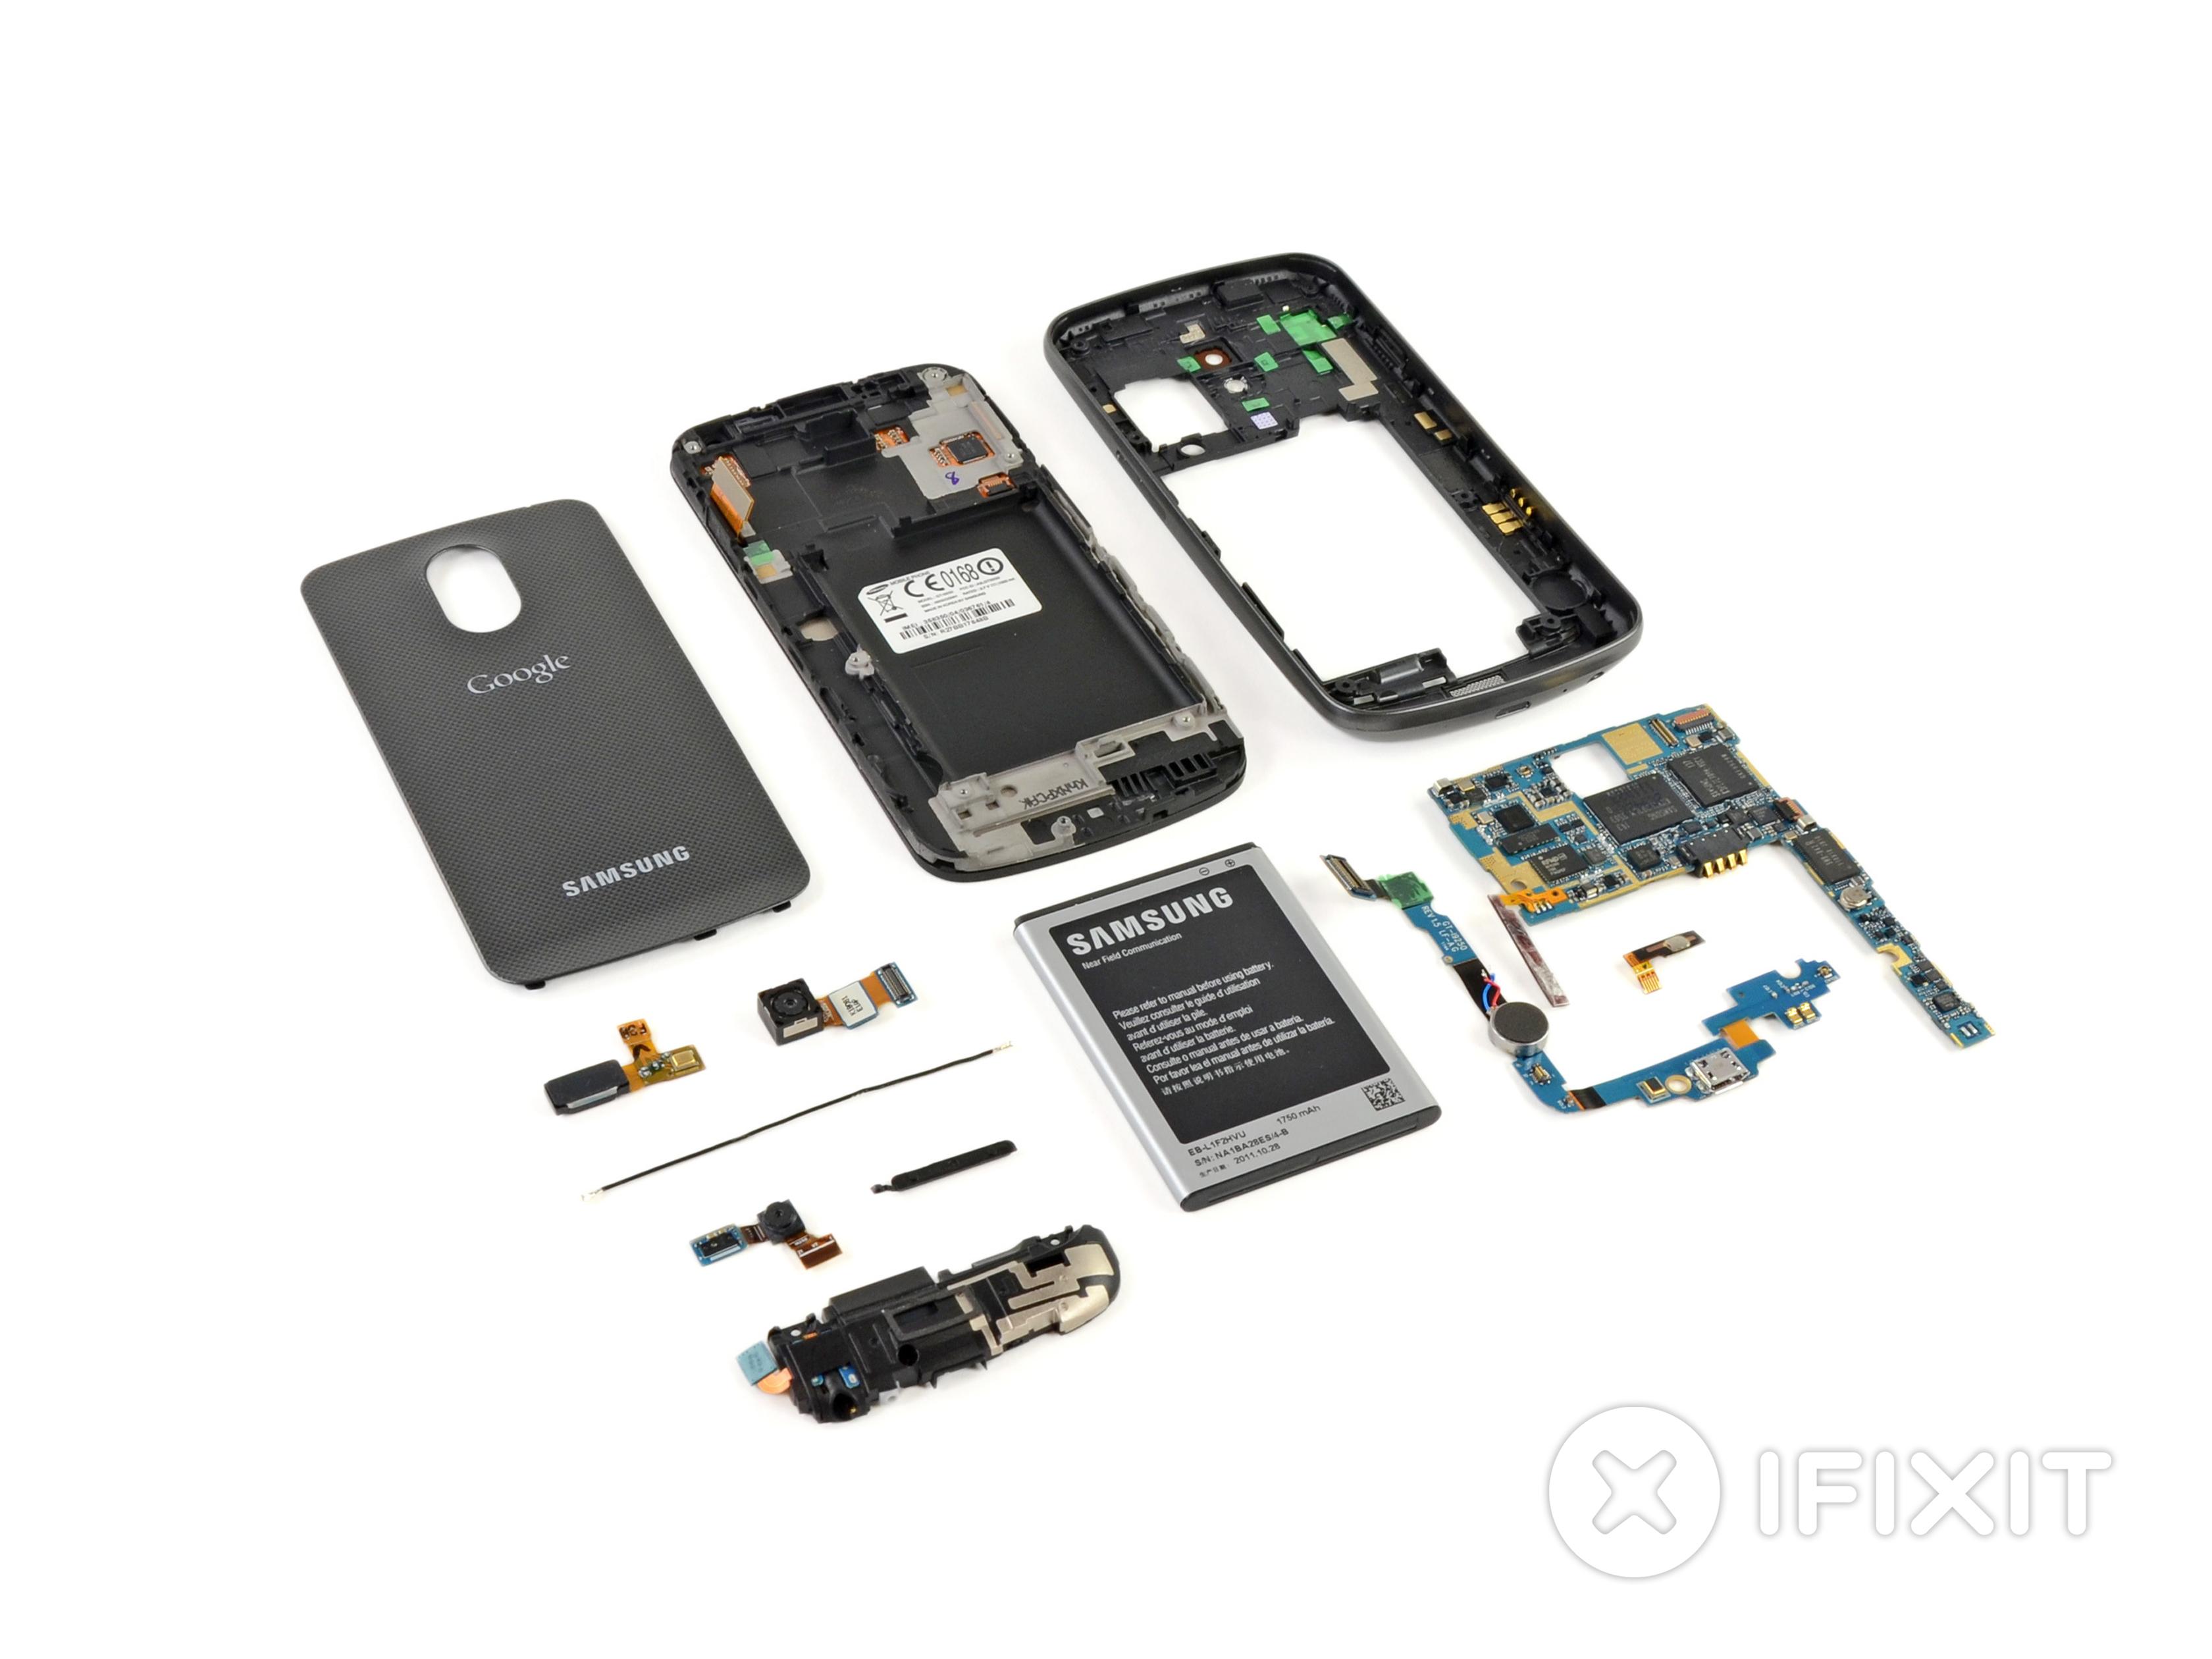 Samsung Galaxy Nexus Teardown Ifixit Wiring Diagram Further Tab 2 Charger On Usb 0